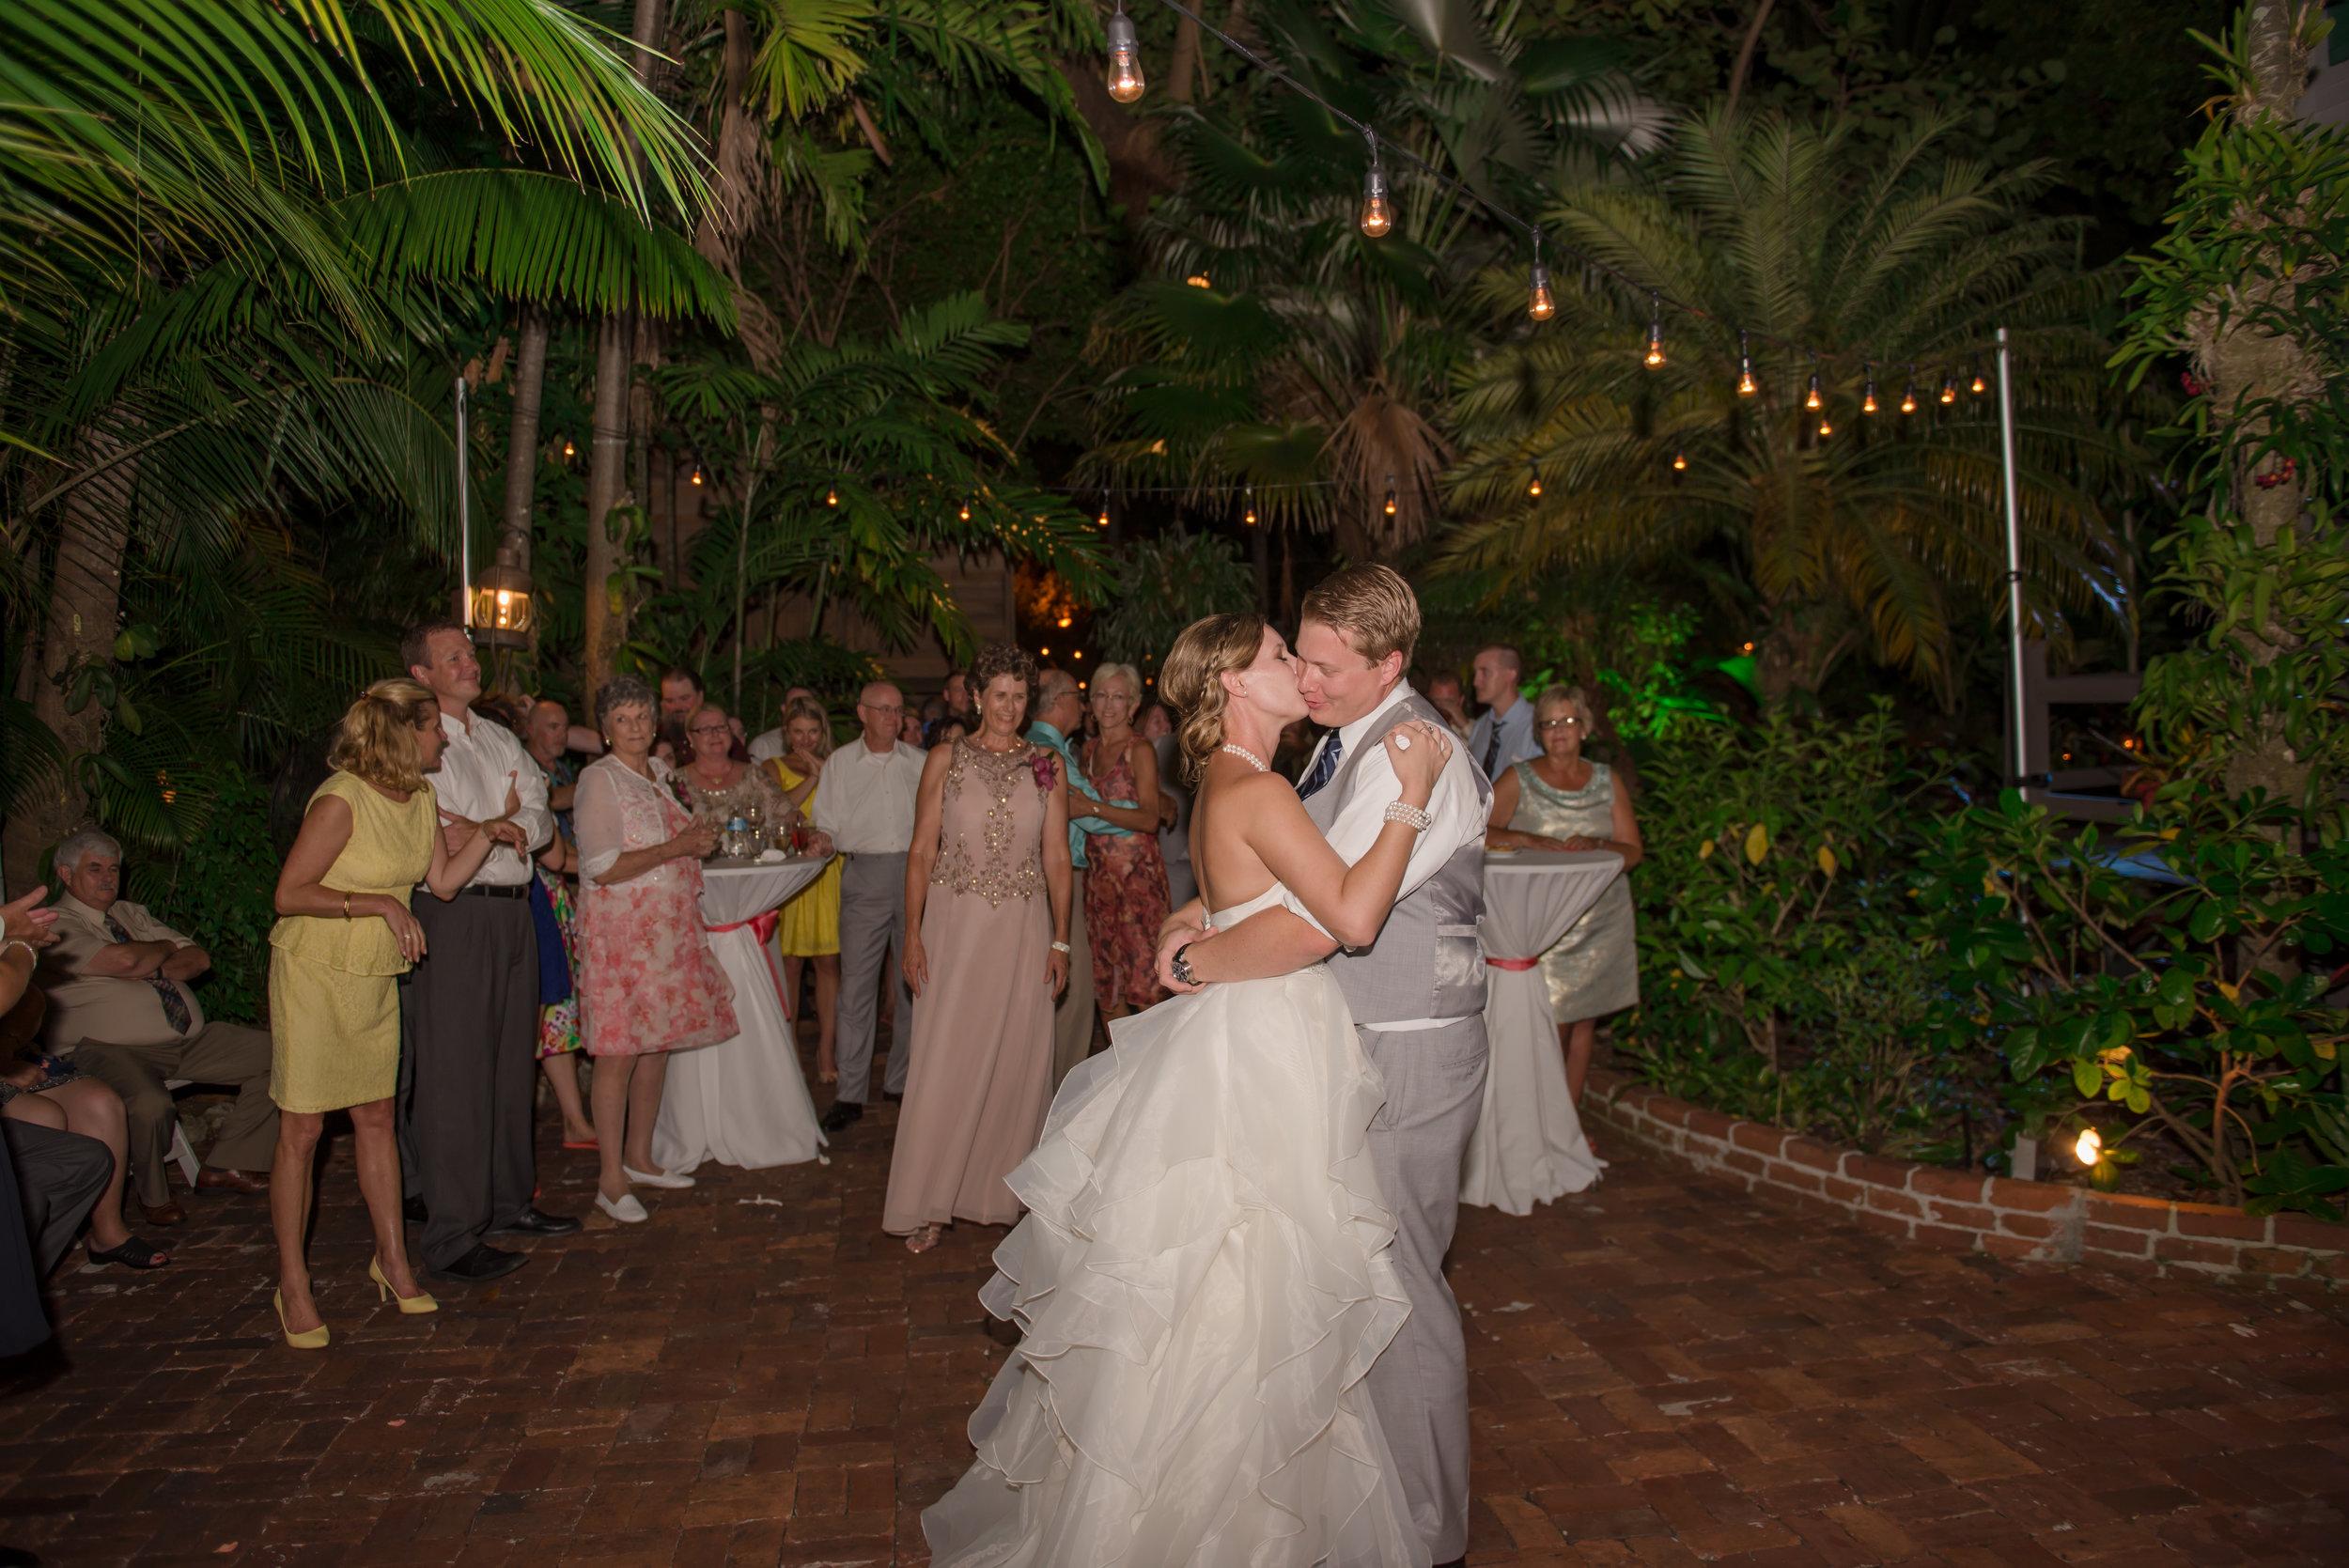 Amanda+James_Audubon House Key West Wedding28.jpg